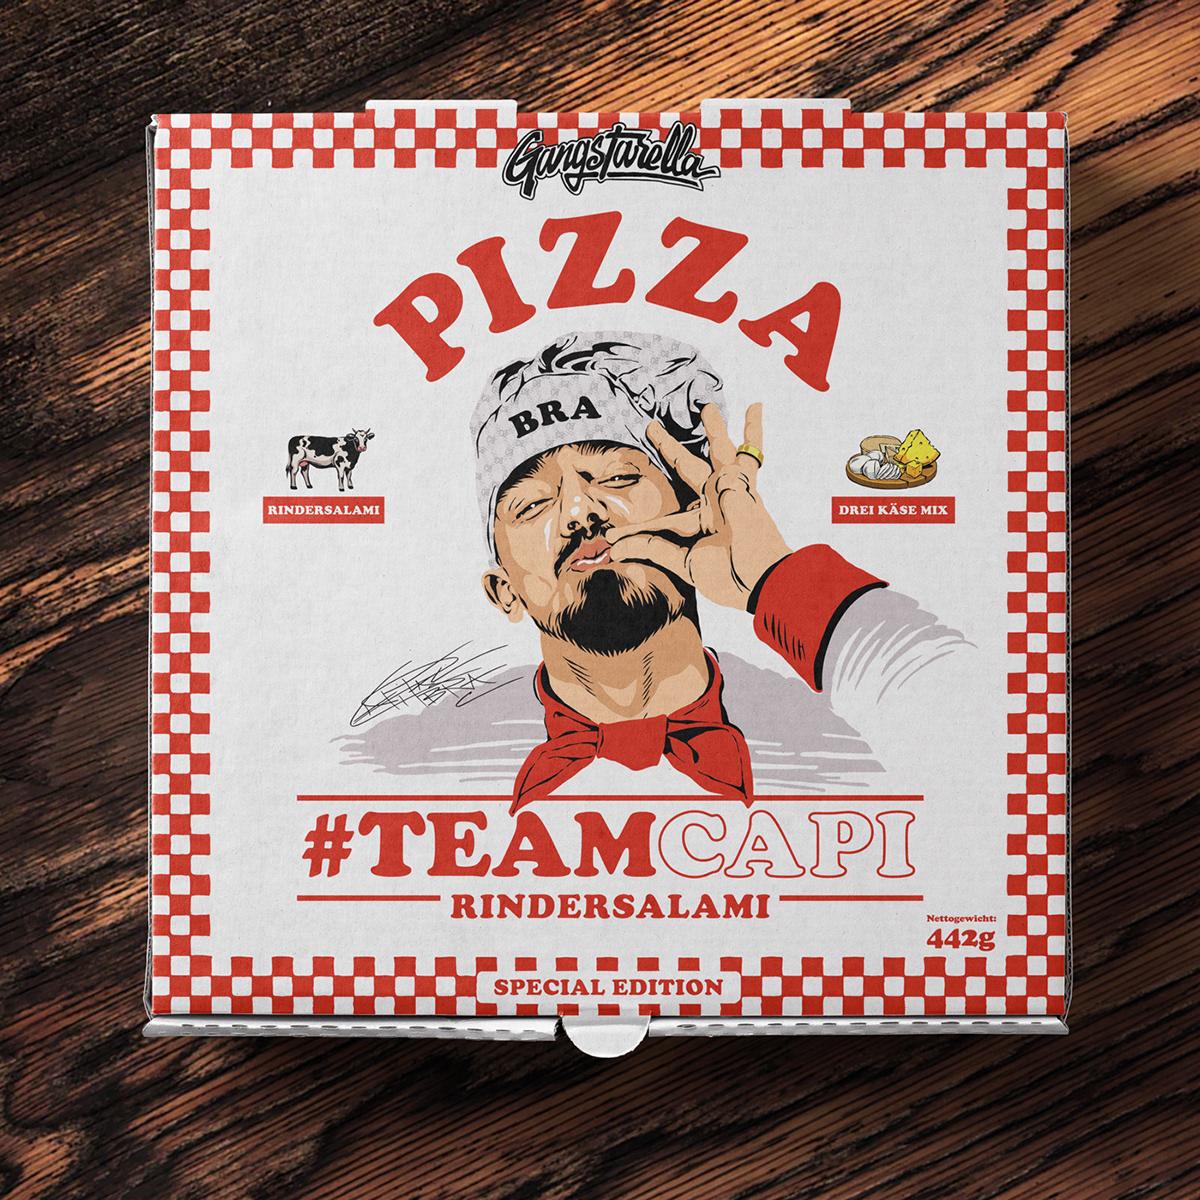 CAPITAL BRA gangstarella Packaging Pizza rap rapper universal music